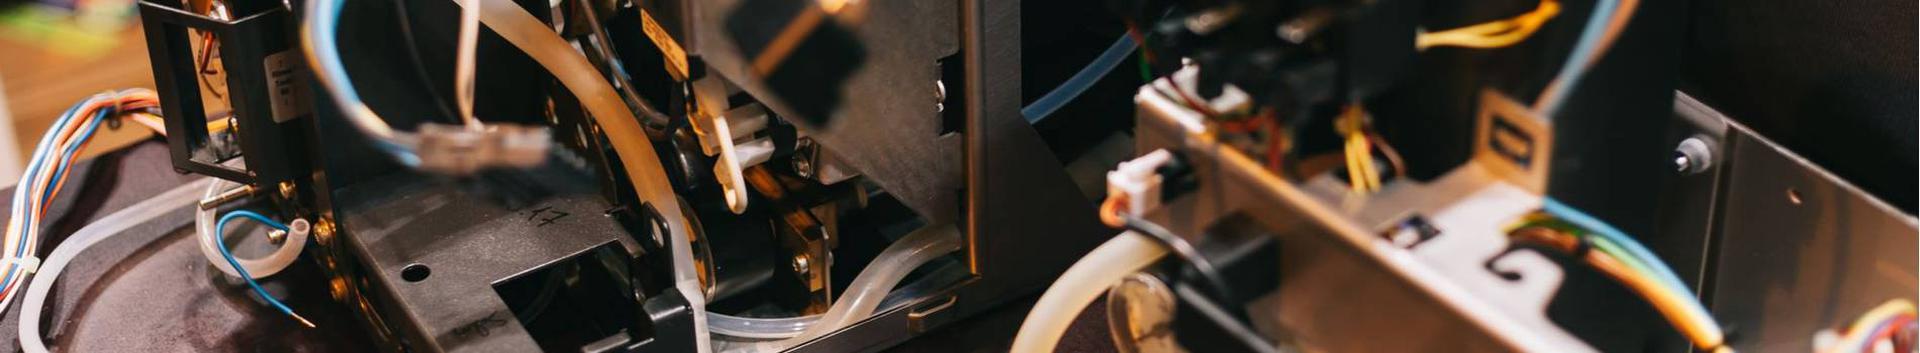 33121_masinate-ja-seadmete-remont_33594289_xl.jpg